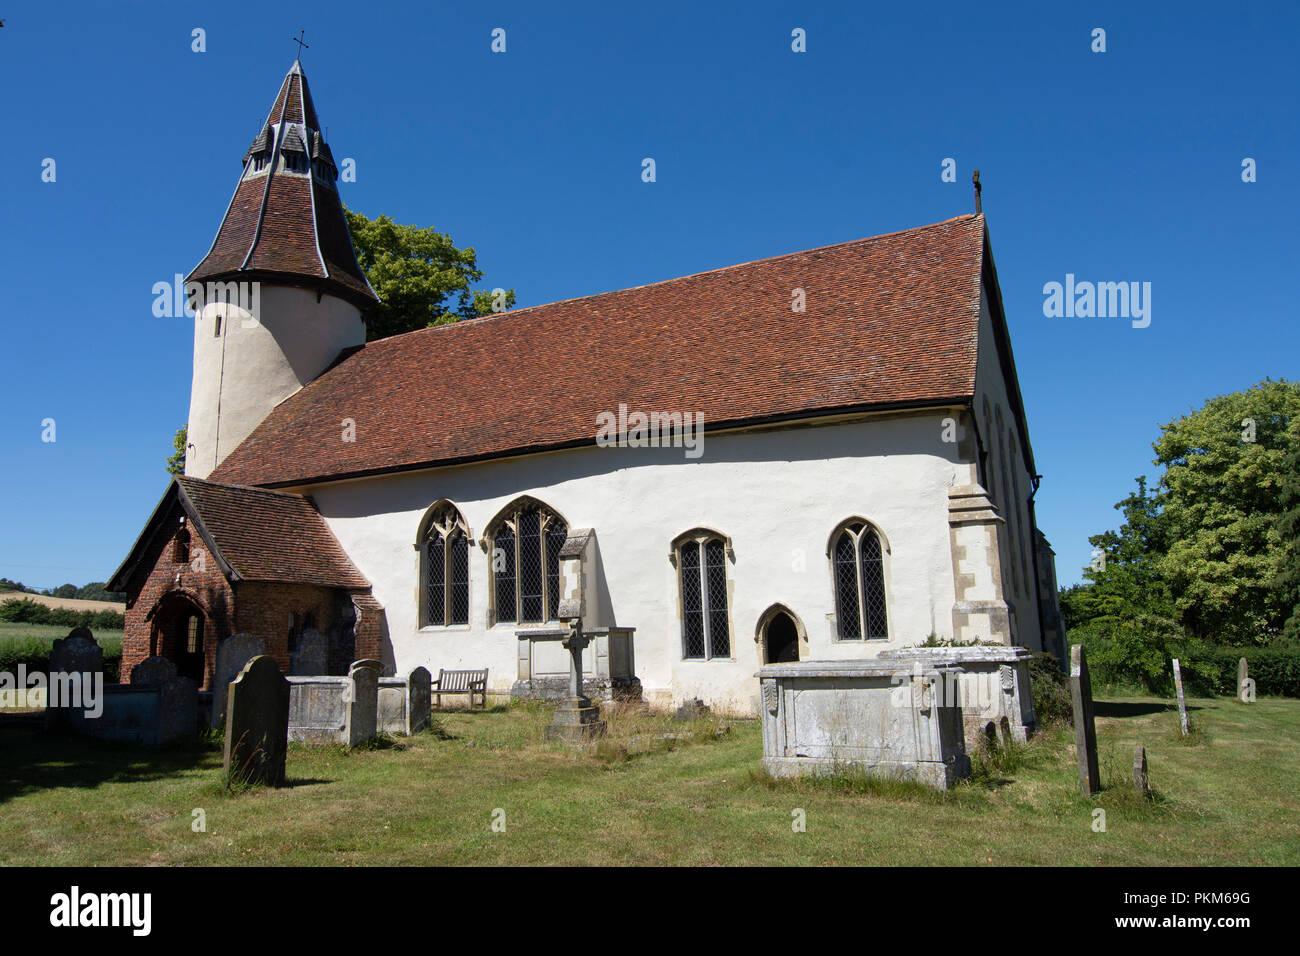 Holy Innocents Church, Lamarsh, Essex Stock Photo: 218646892